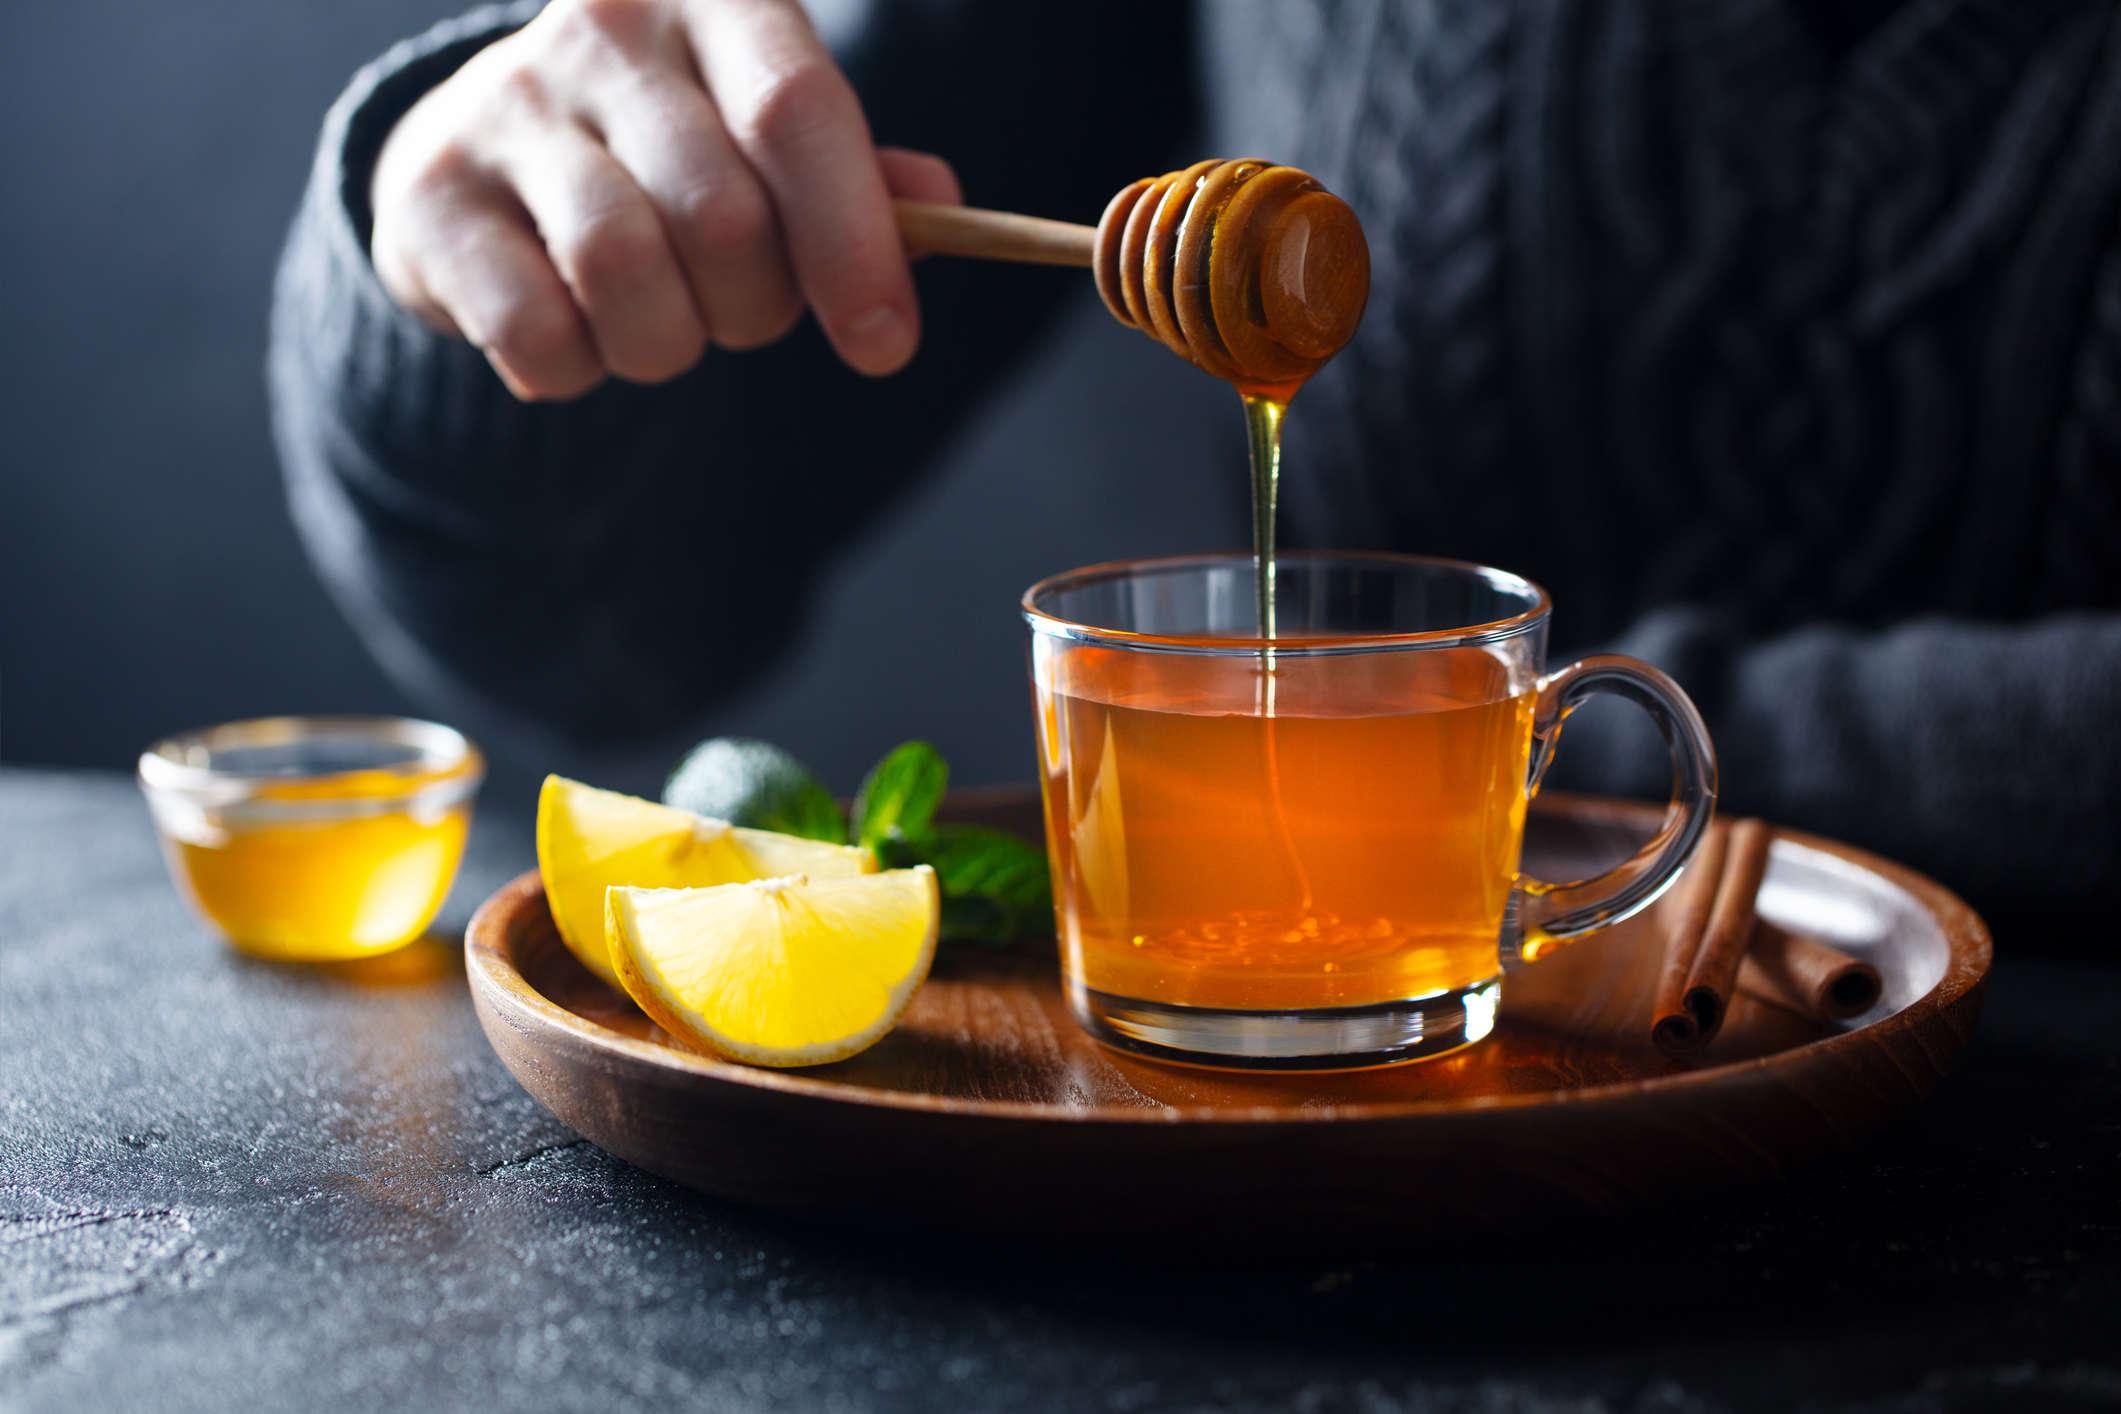 Lemon and honey are key ingredients used in K-beauty